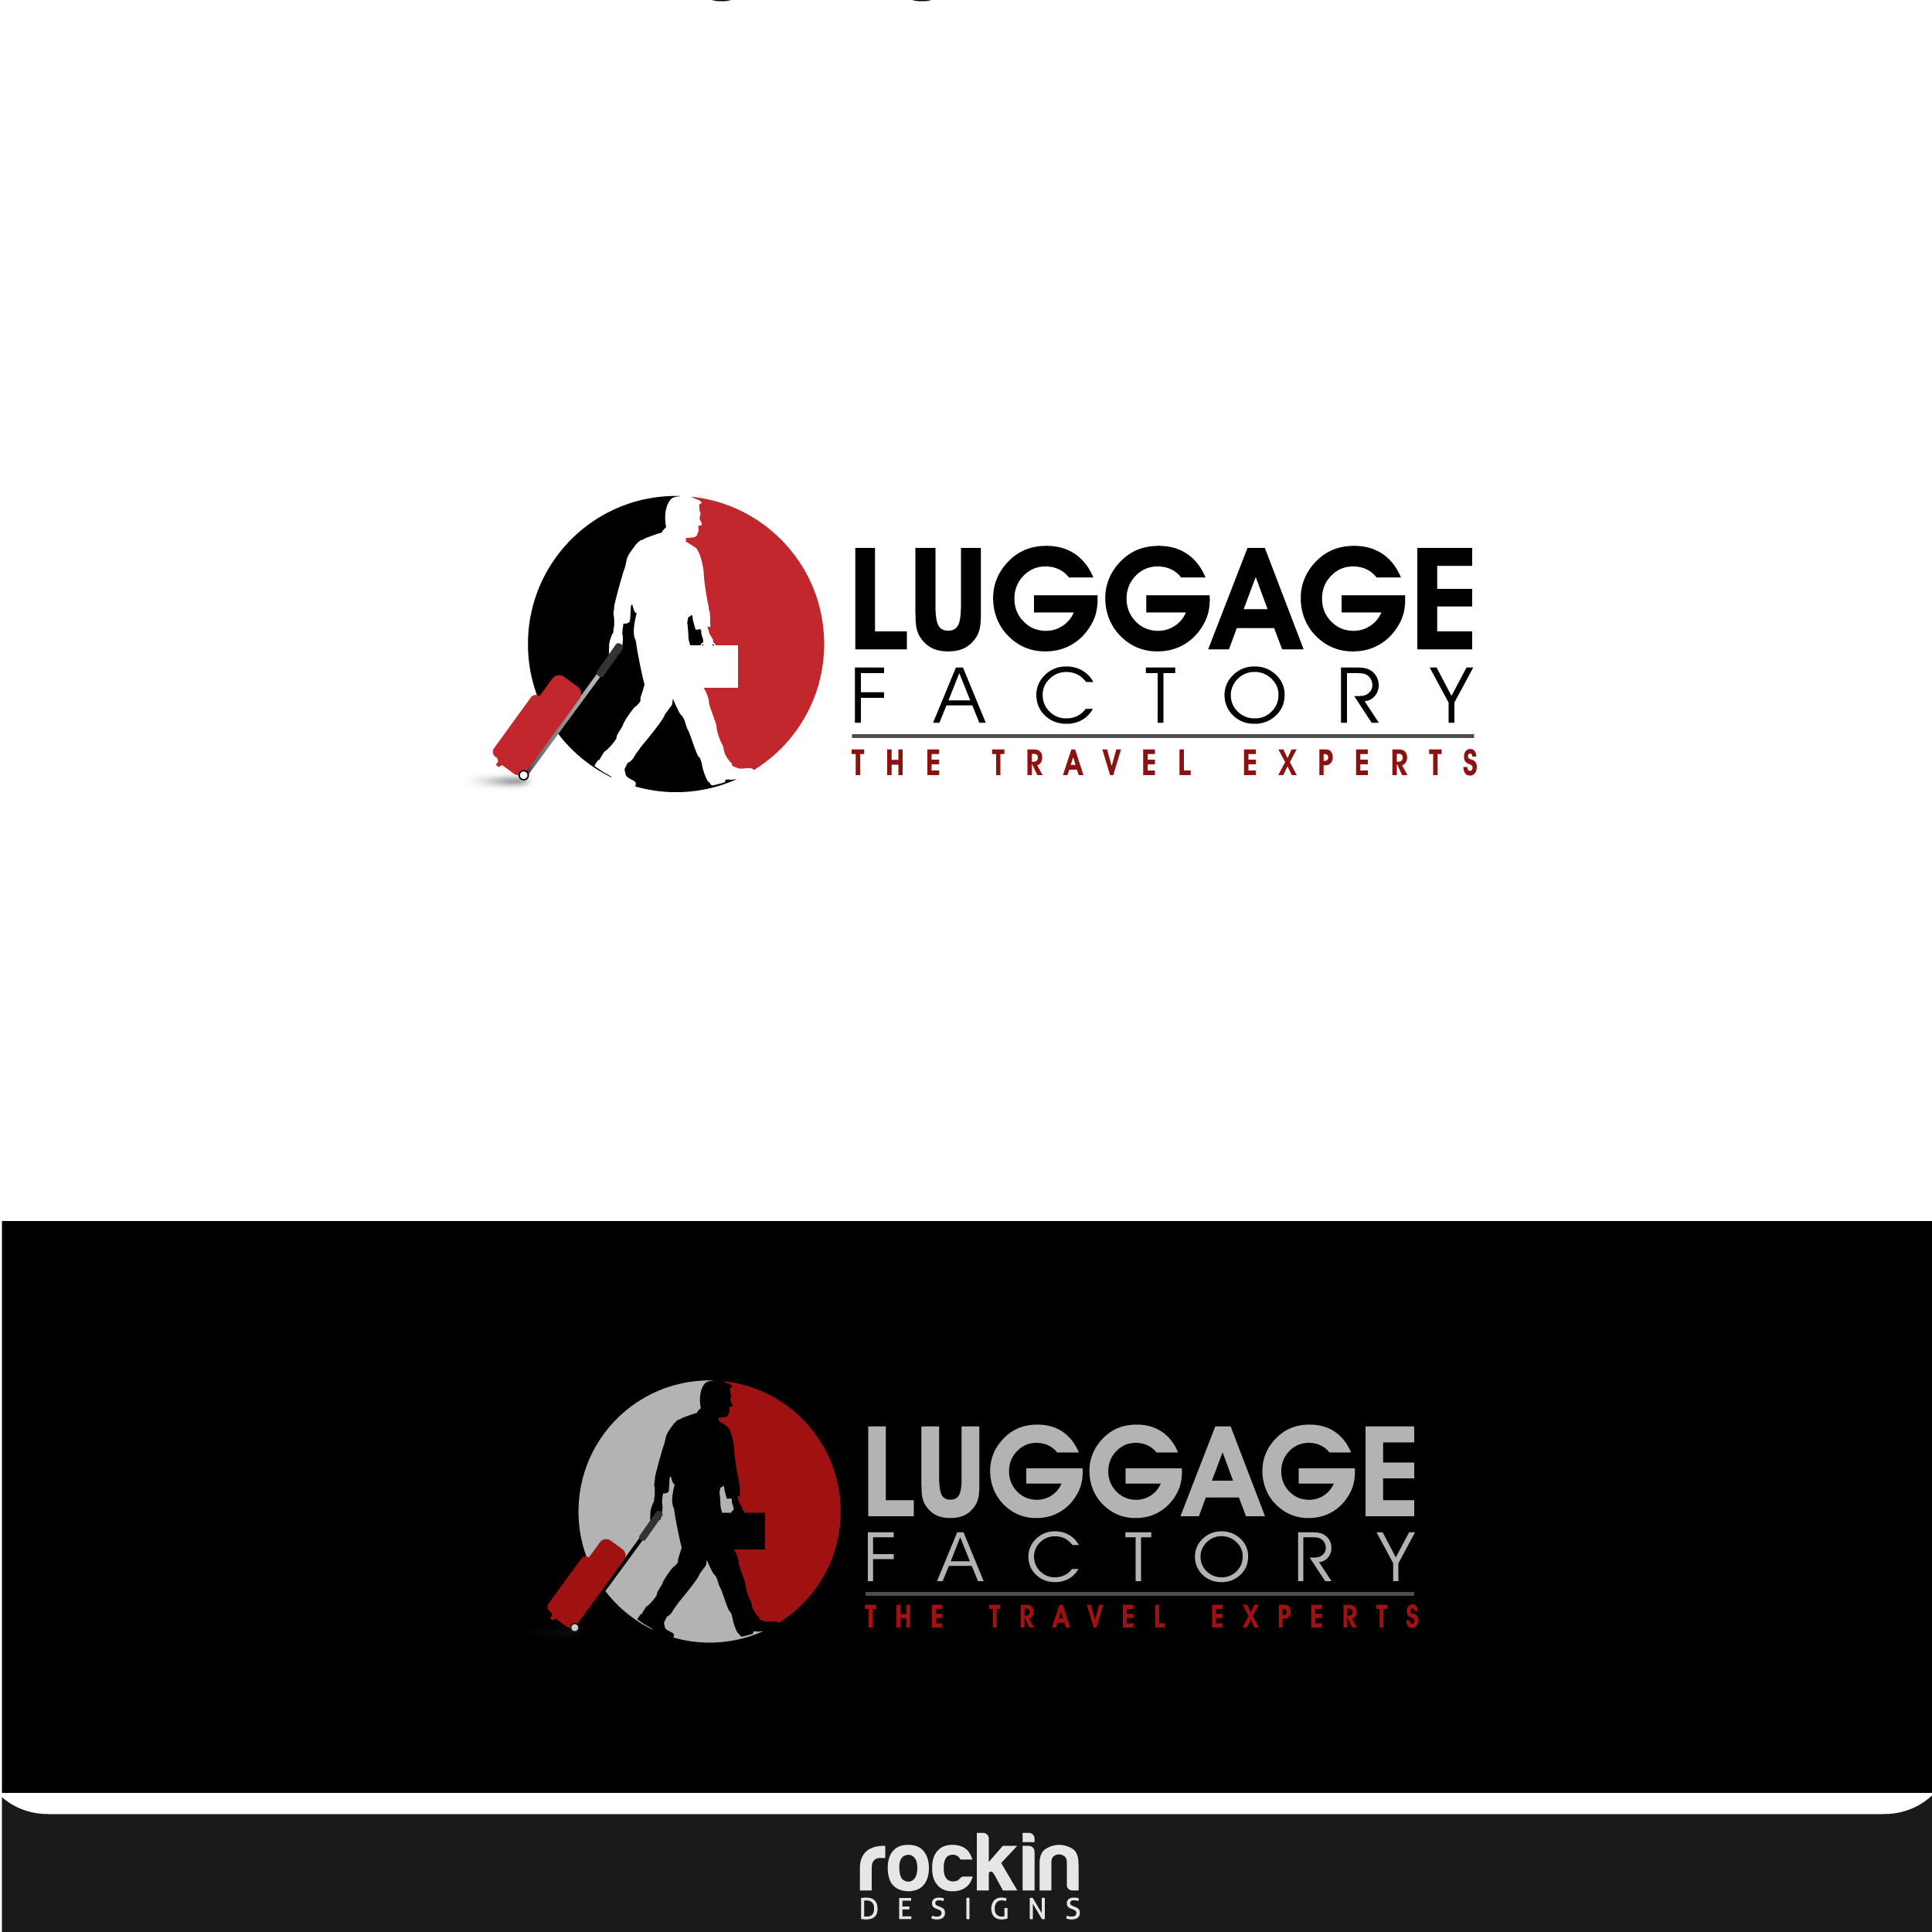 Logo Design by rockin - Entry No. 112 in the Logo Design Contest Creative Logo Design for Luggage Factory.